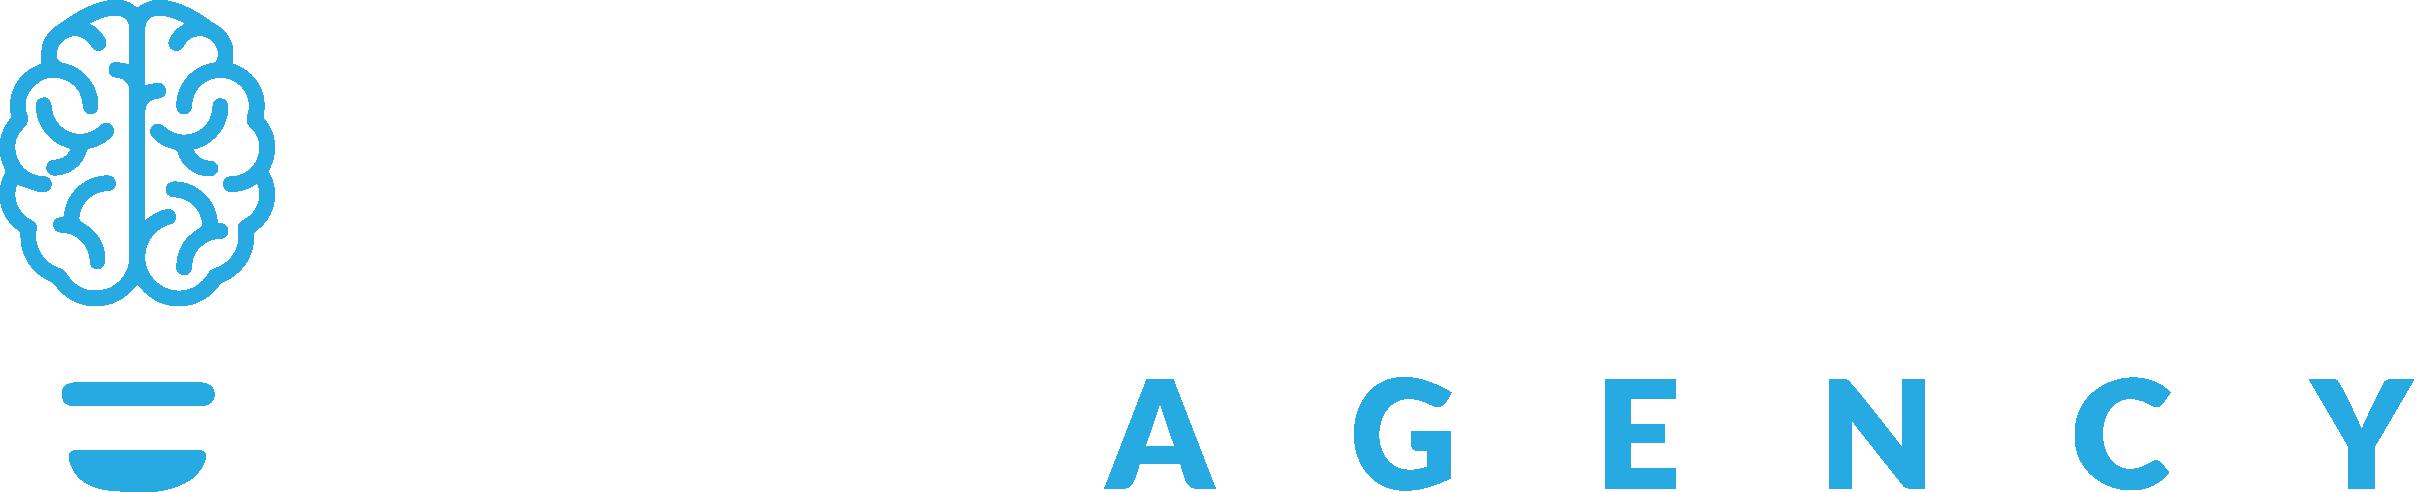 Real Creative Agency, Digital Marketing Experts